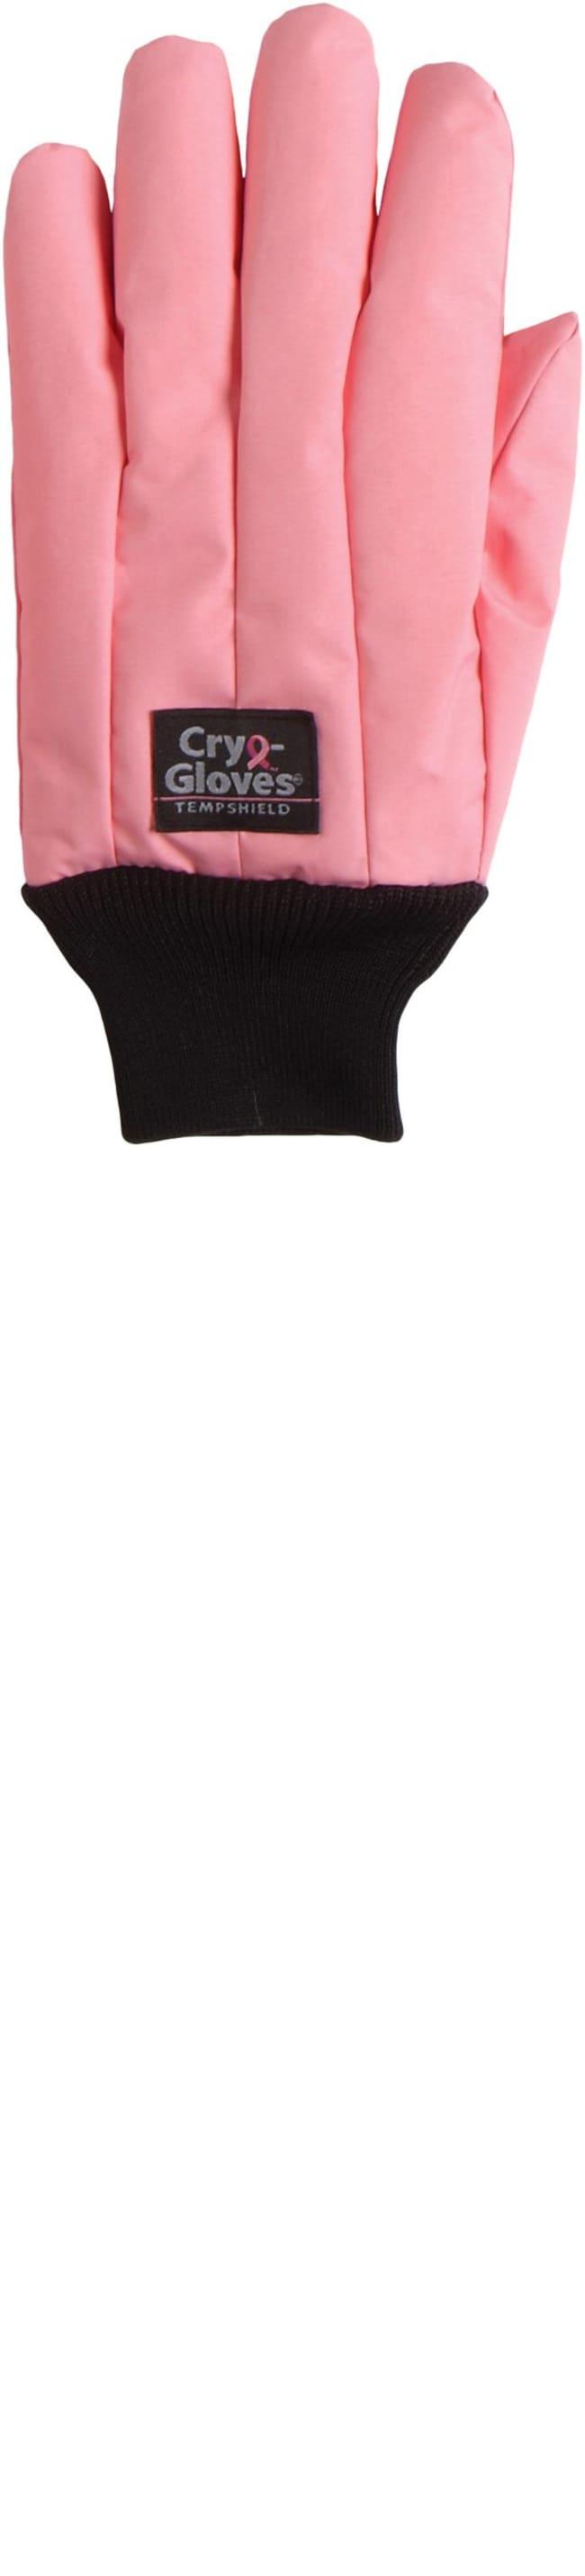 Tempshield™Pink Cryo-Gloves™